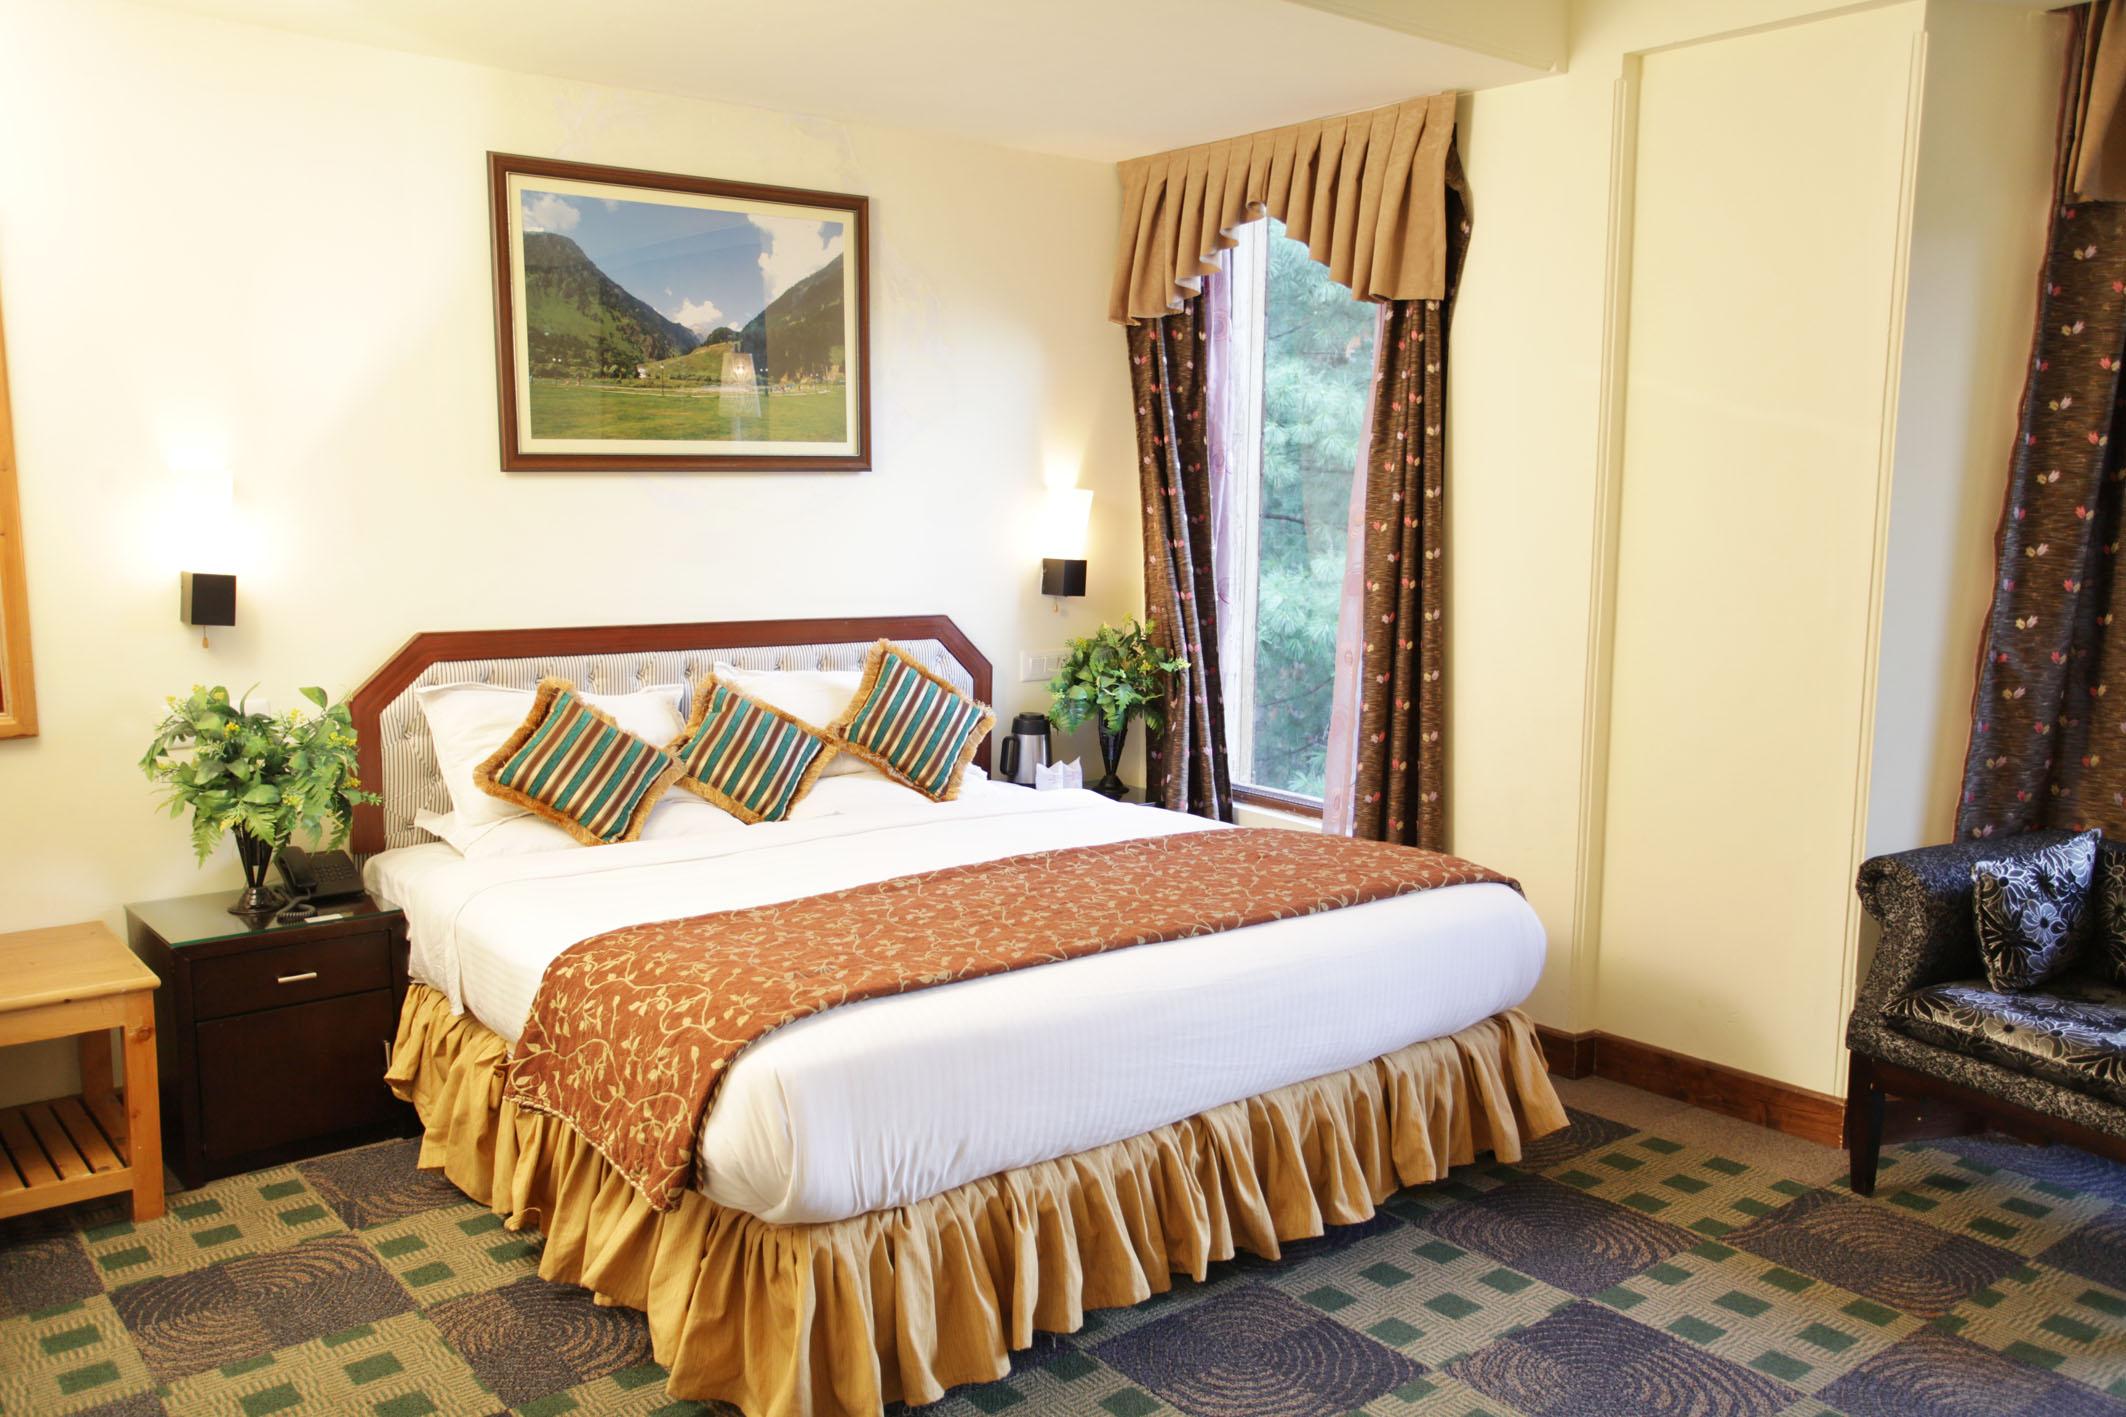 http://grandmumtaz.com/wp-content/uploads/2019/02/grand-mumtaz-resorts-pahalgam-15.jpg